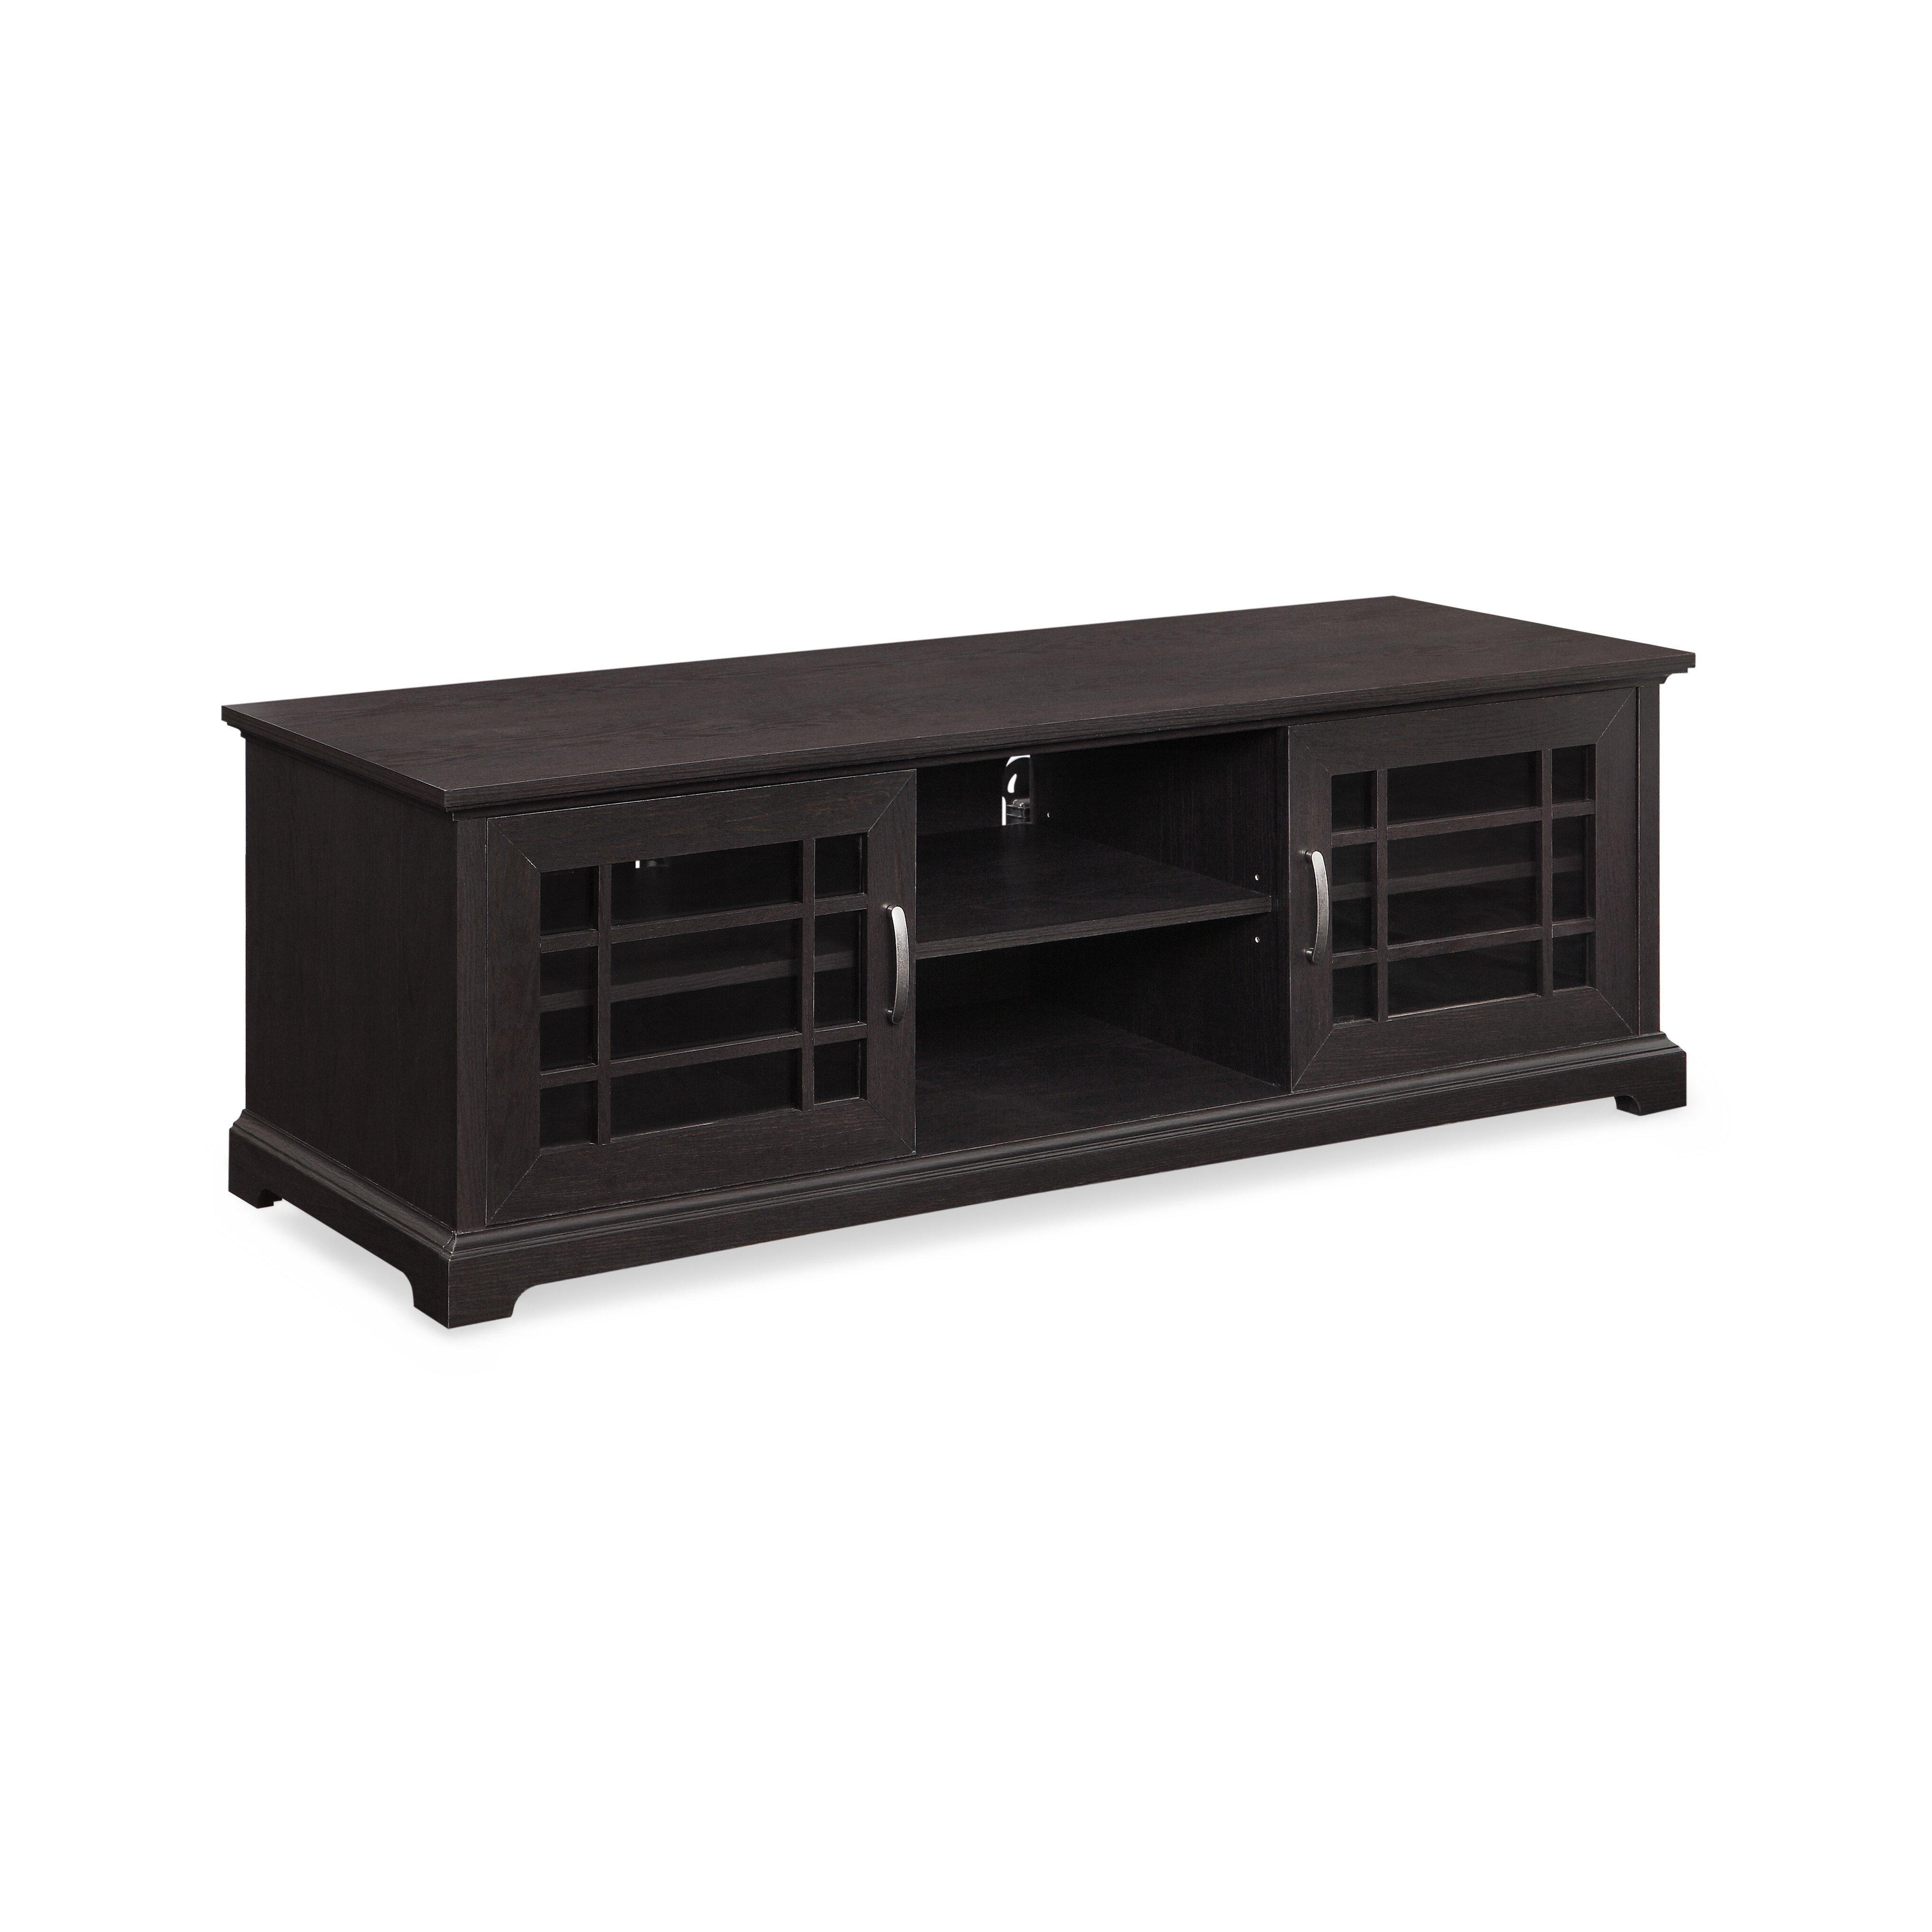 whalen furniture calistoga tv stand reviews wayfair